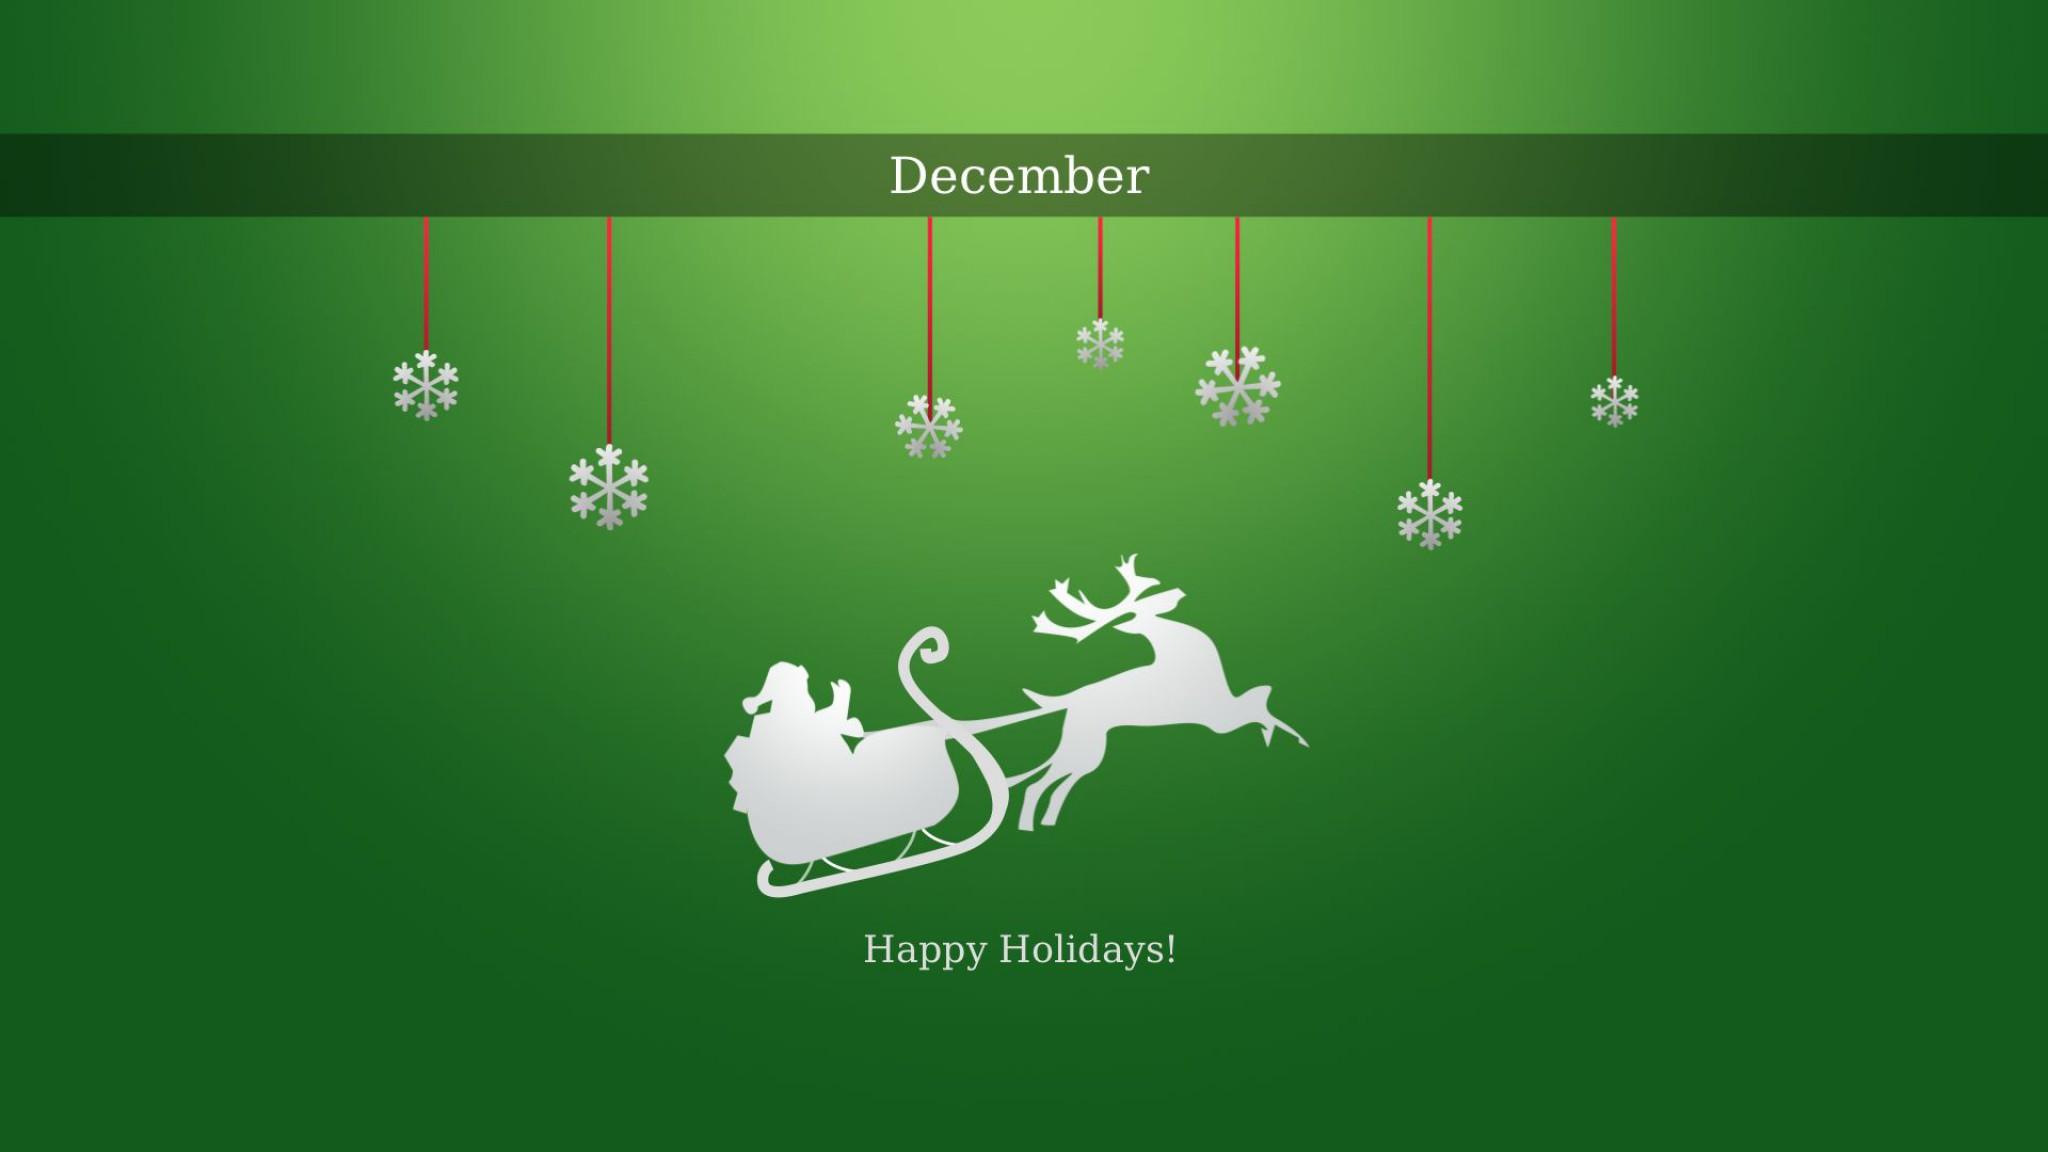 Happy Holidays Hd Wallpaper Hintergrund 2048x1152 Id